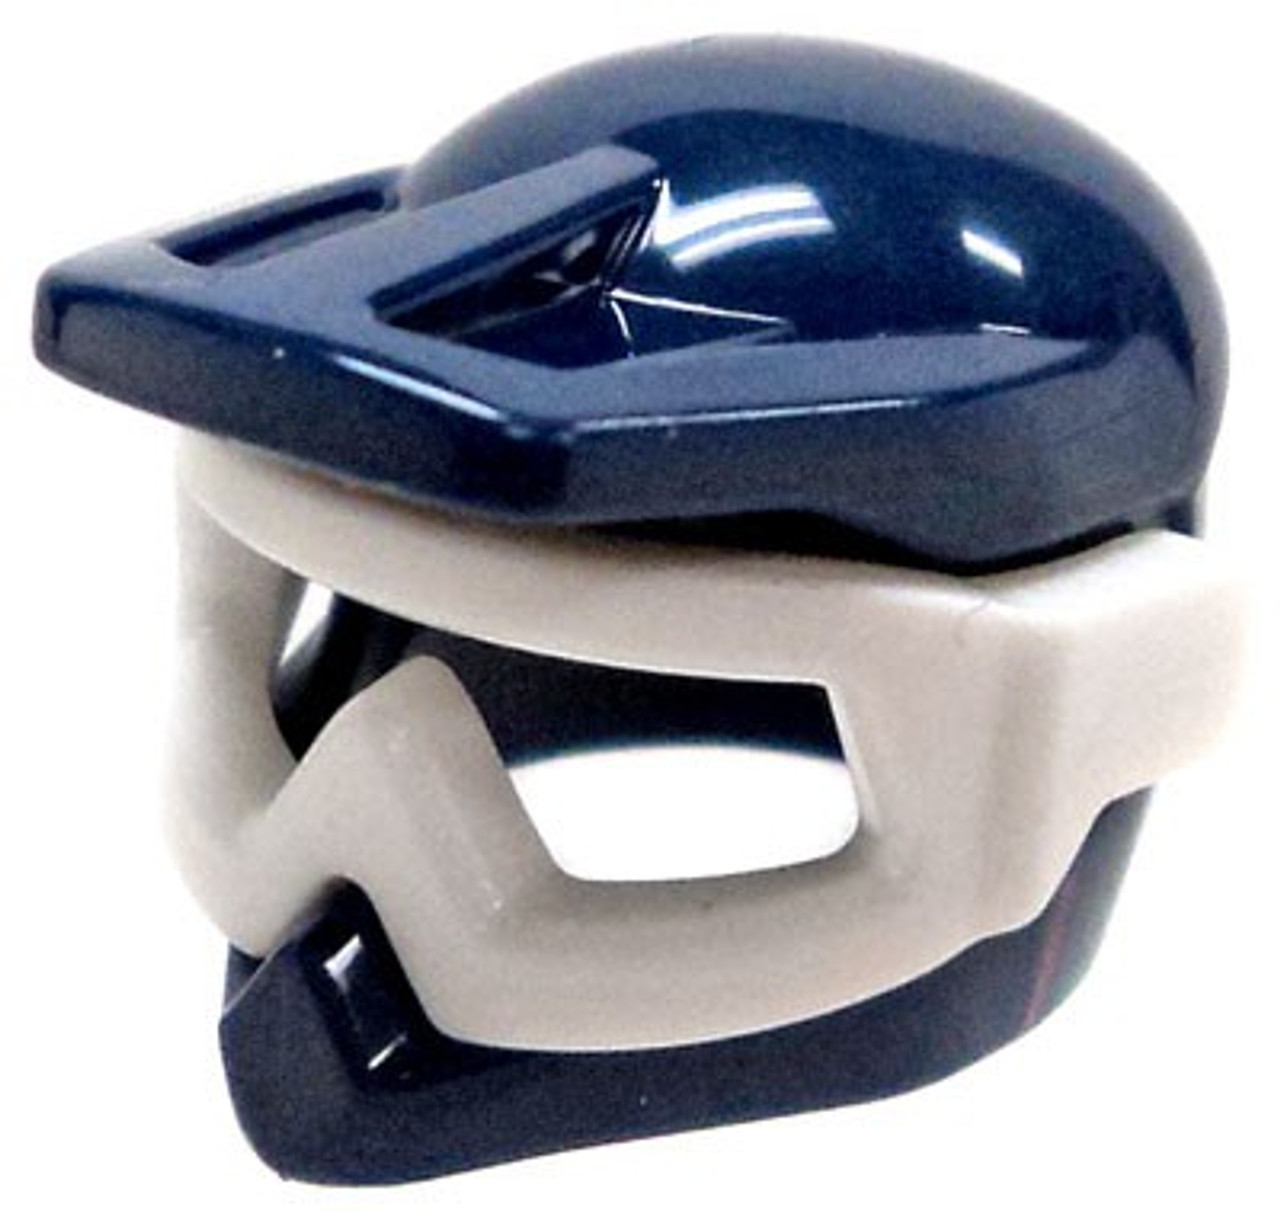 a19c296d LEGO Headgear Dark Blue Dirt Bike Helmet with Goggles Loose - ToyWiz